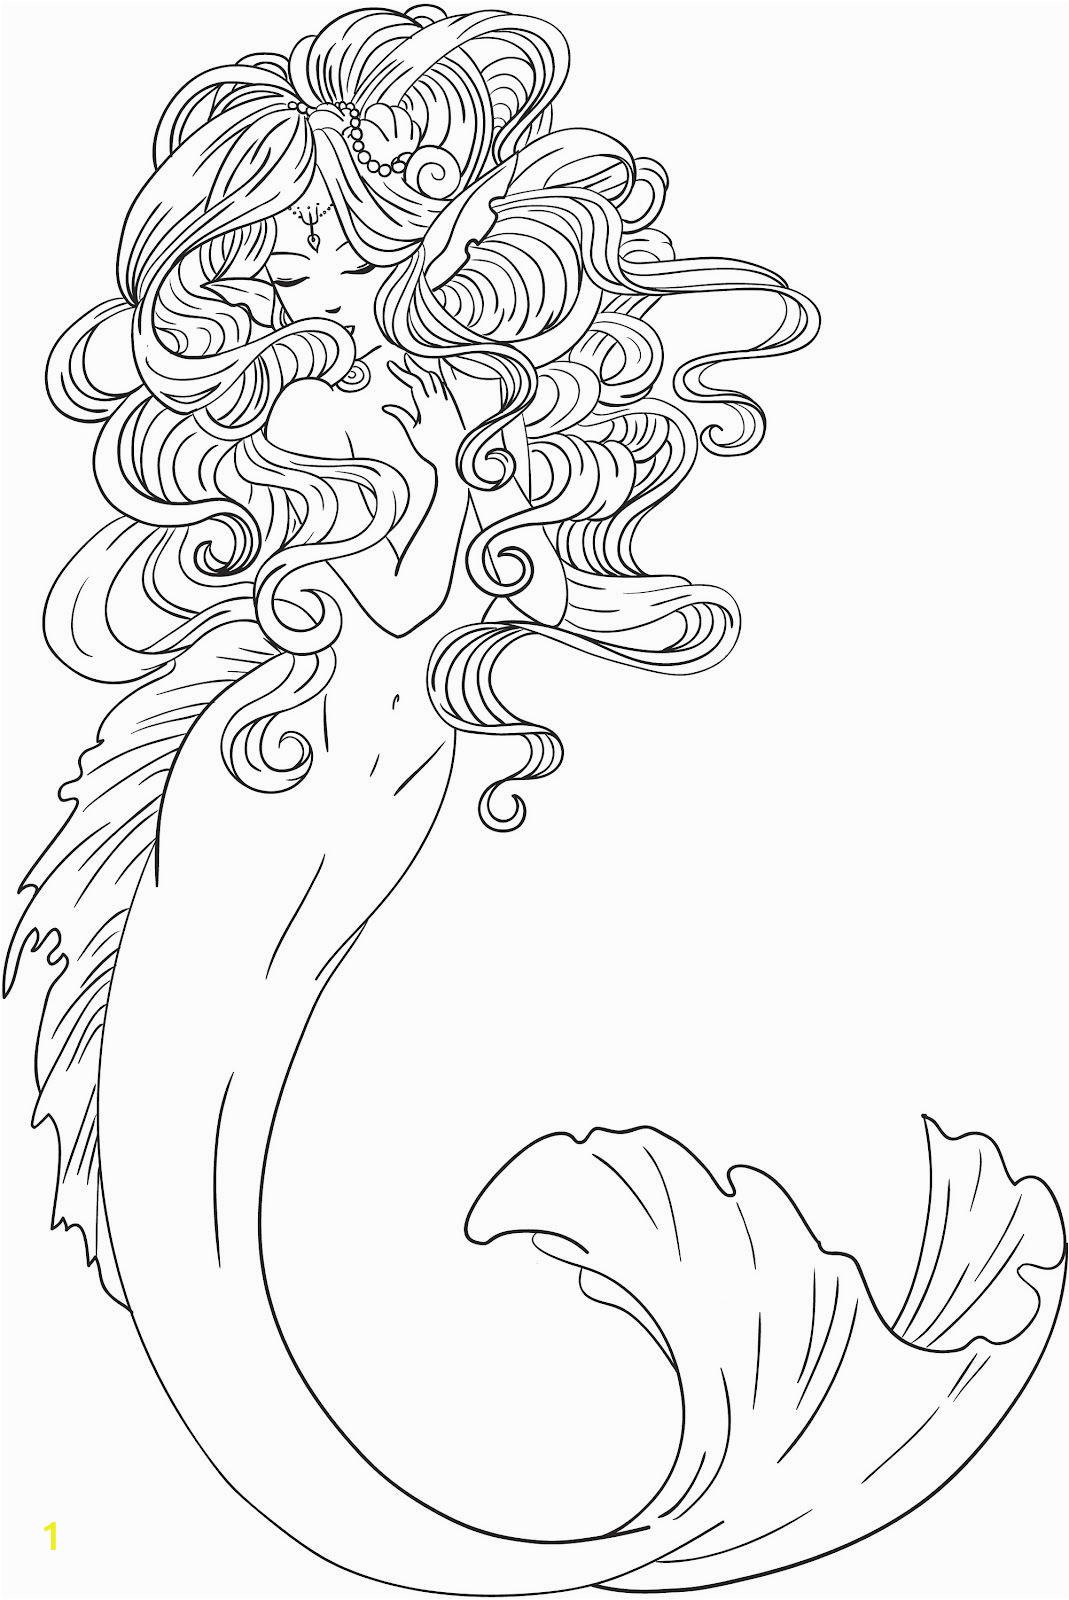 Mermaid Coloring Pages Easy atividades Educativas atividades Infantis atividades